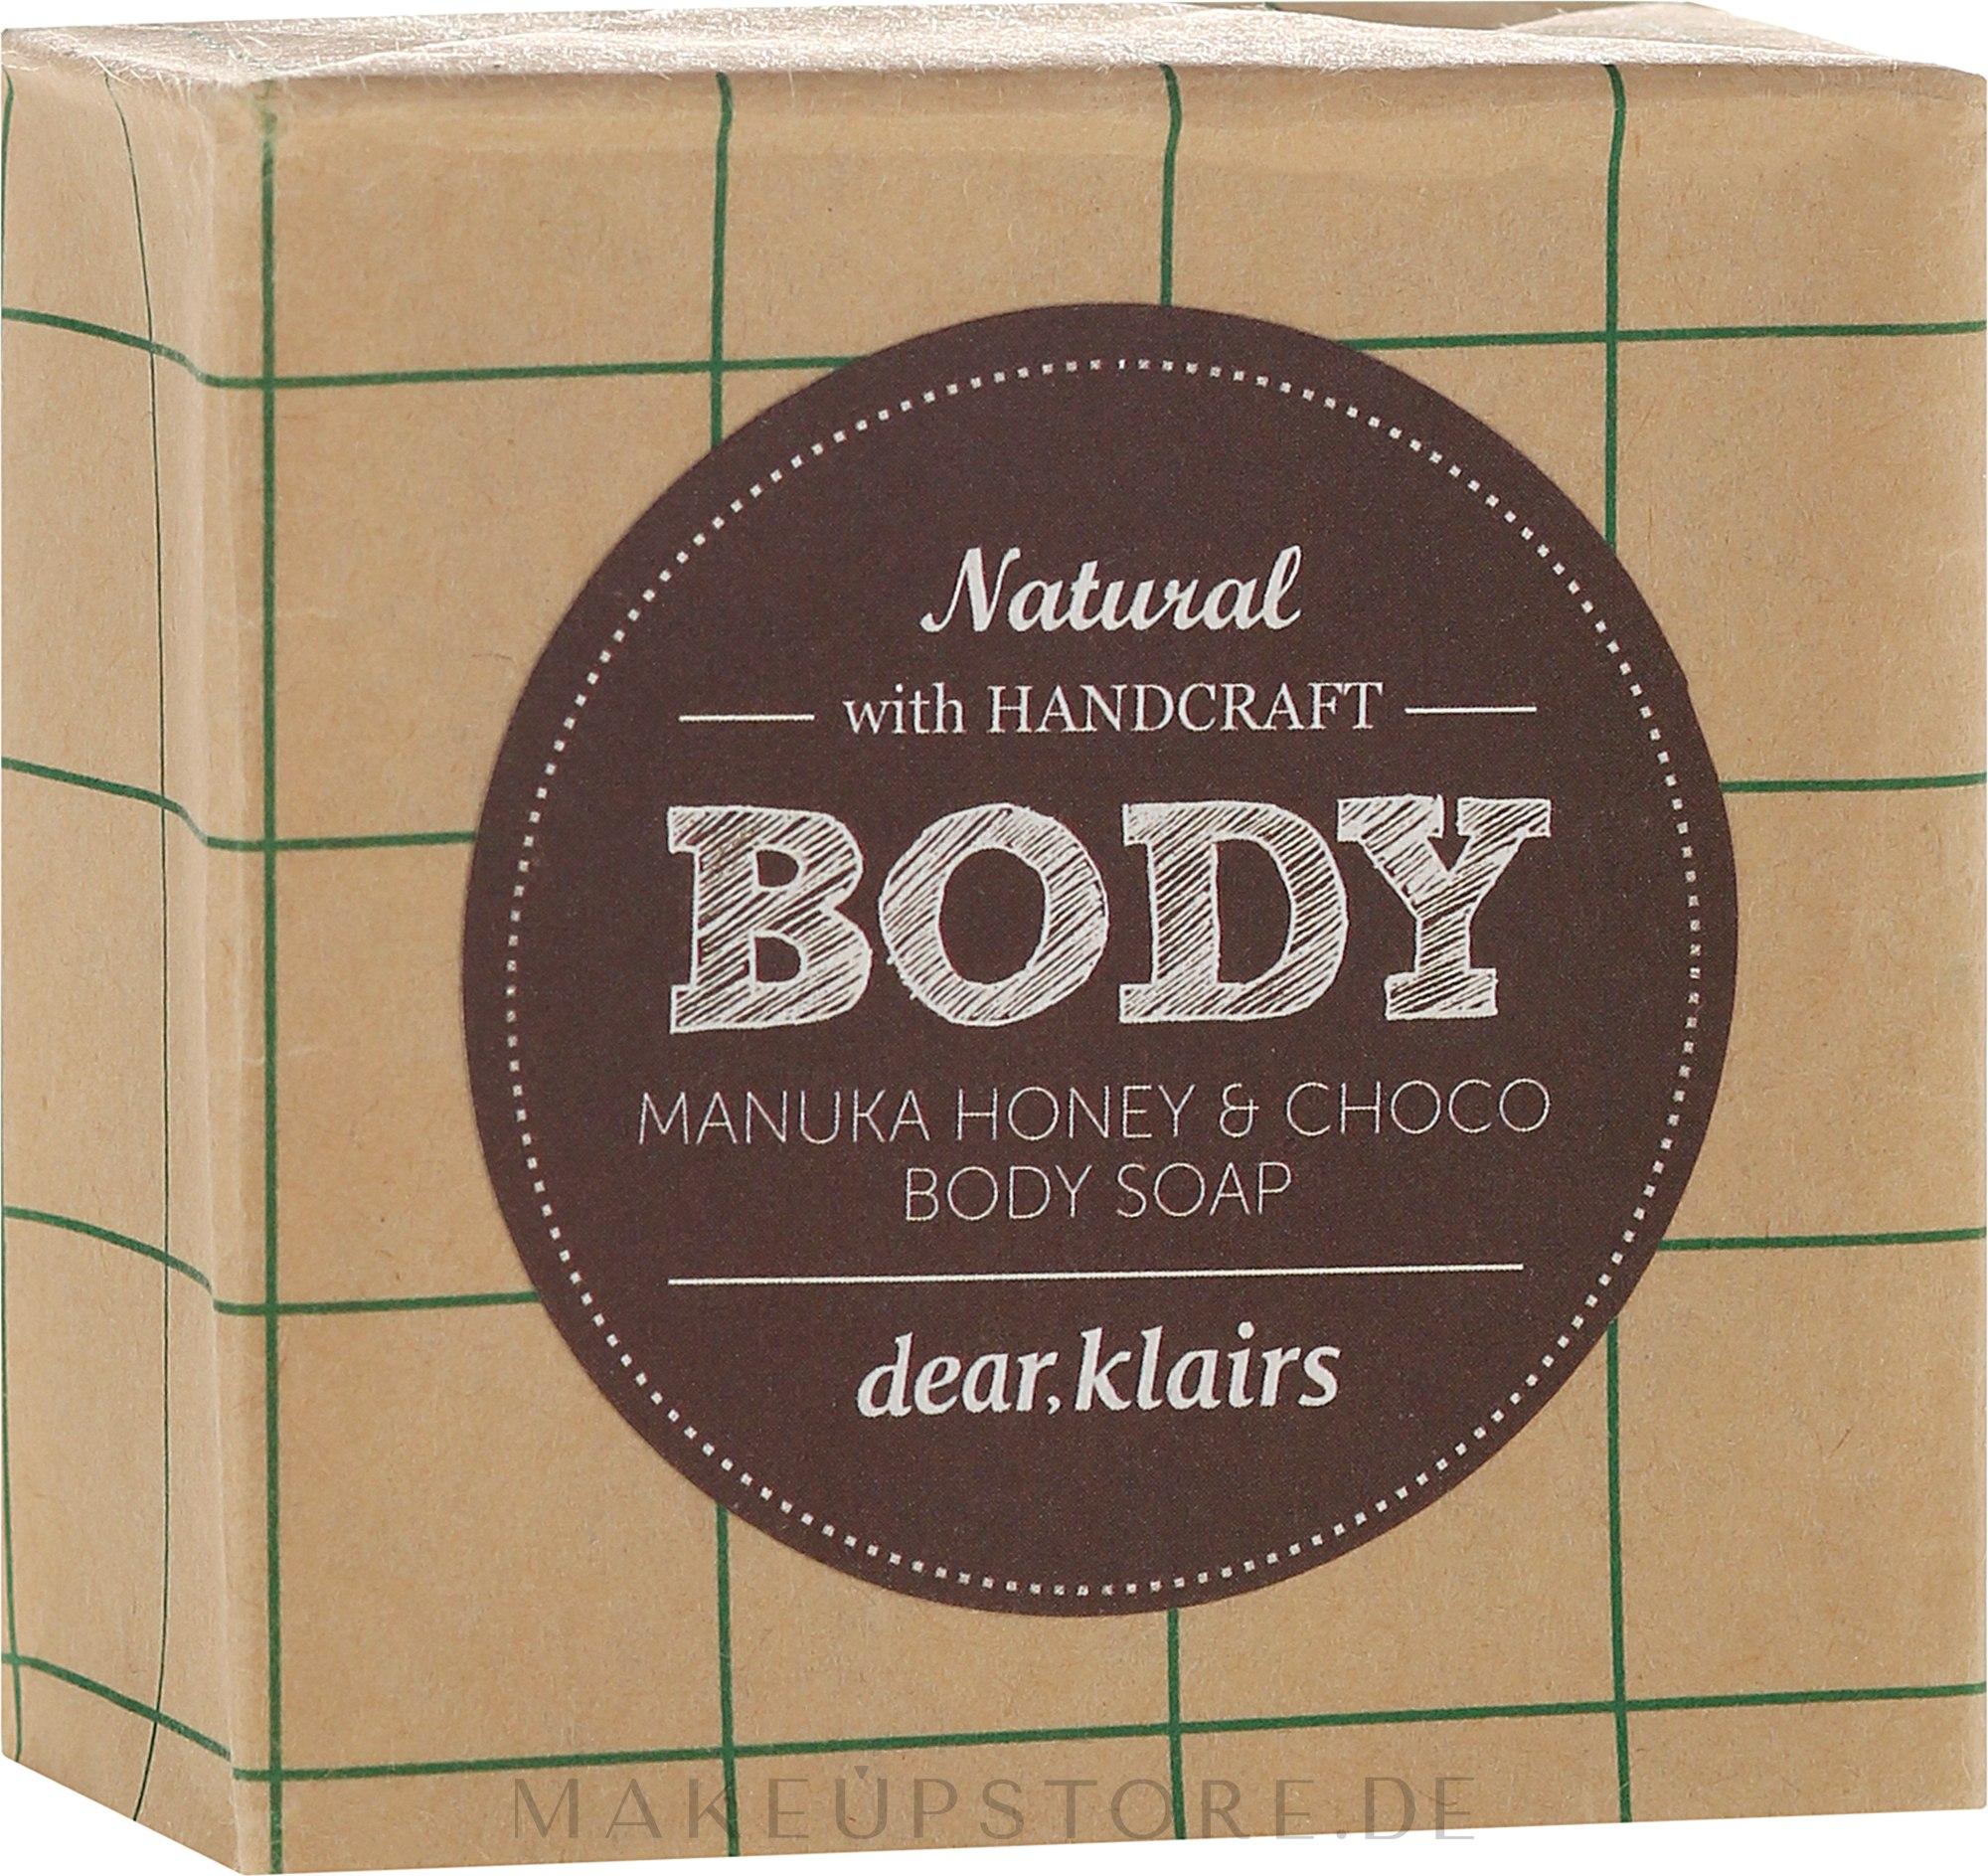 Körperseife mit Honig, Kakao und Olivenöl - Klairs Body Manuka Honey & Choco Body Soap — Bild 100 g